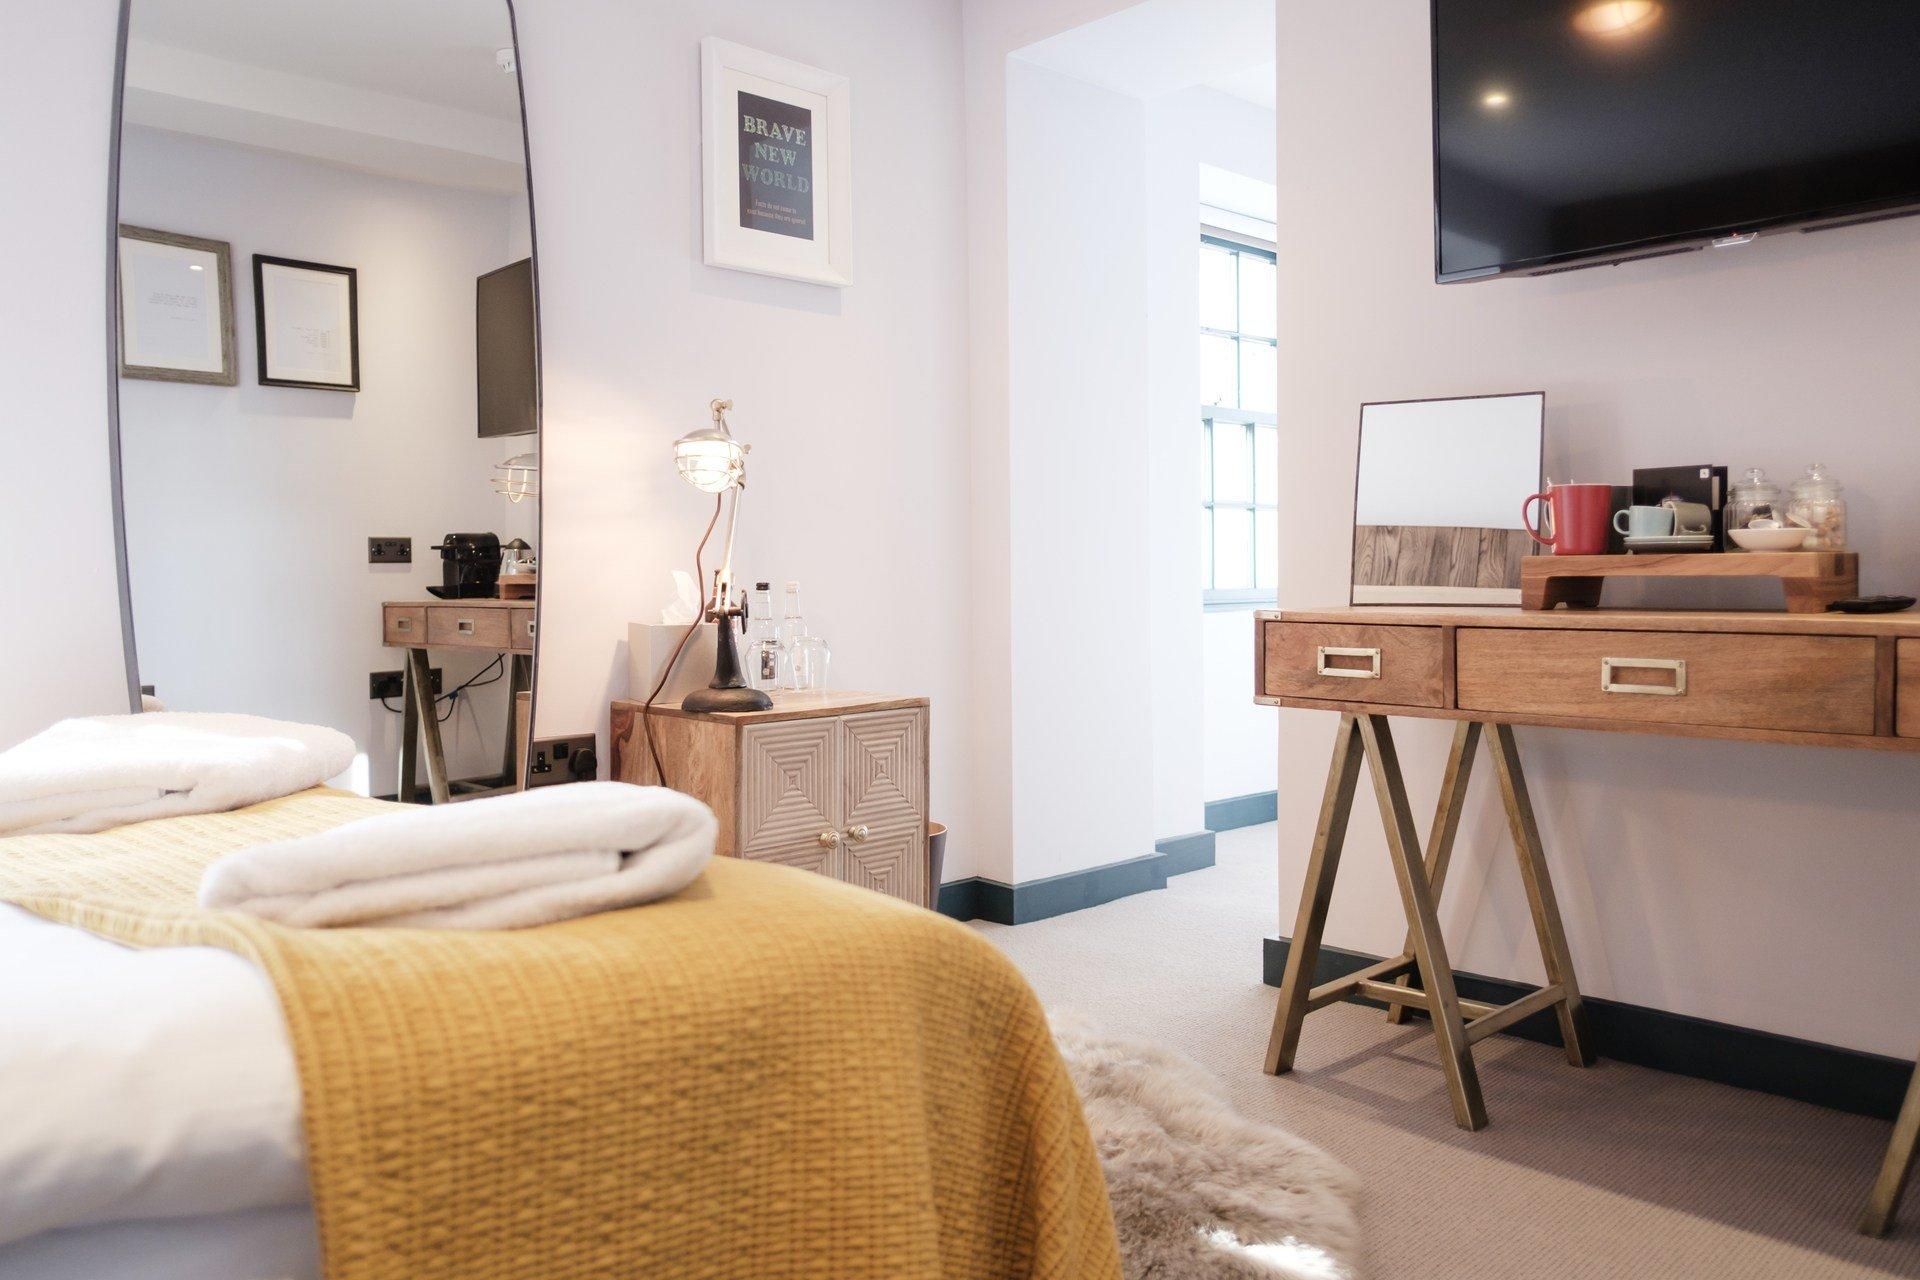 The Head of the River Restaurant, Pub & Bar Oxford - Cosy Bedroom